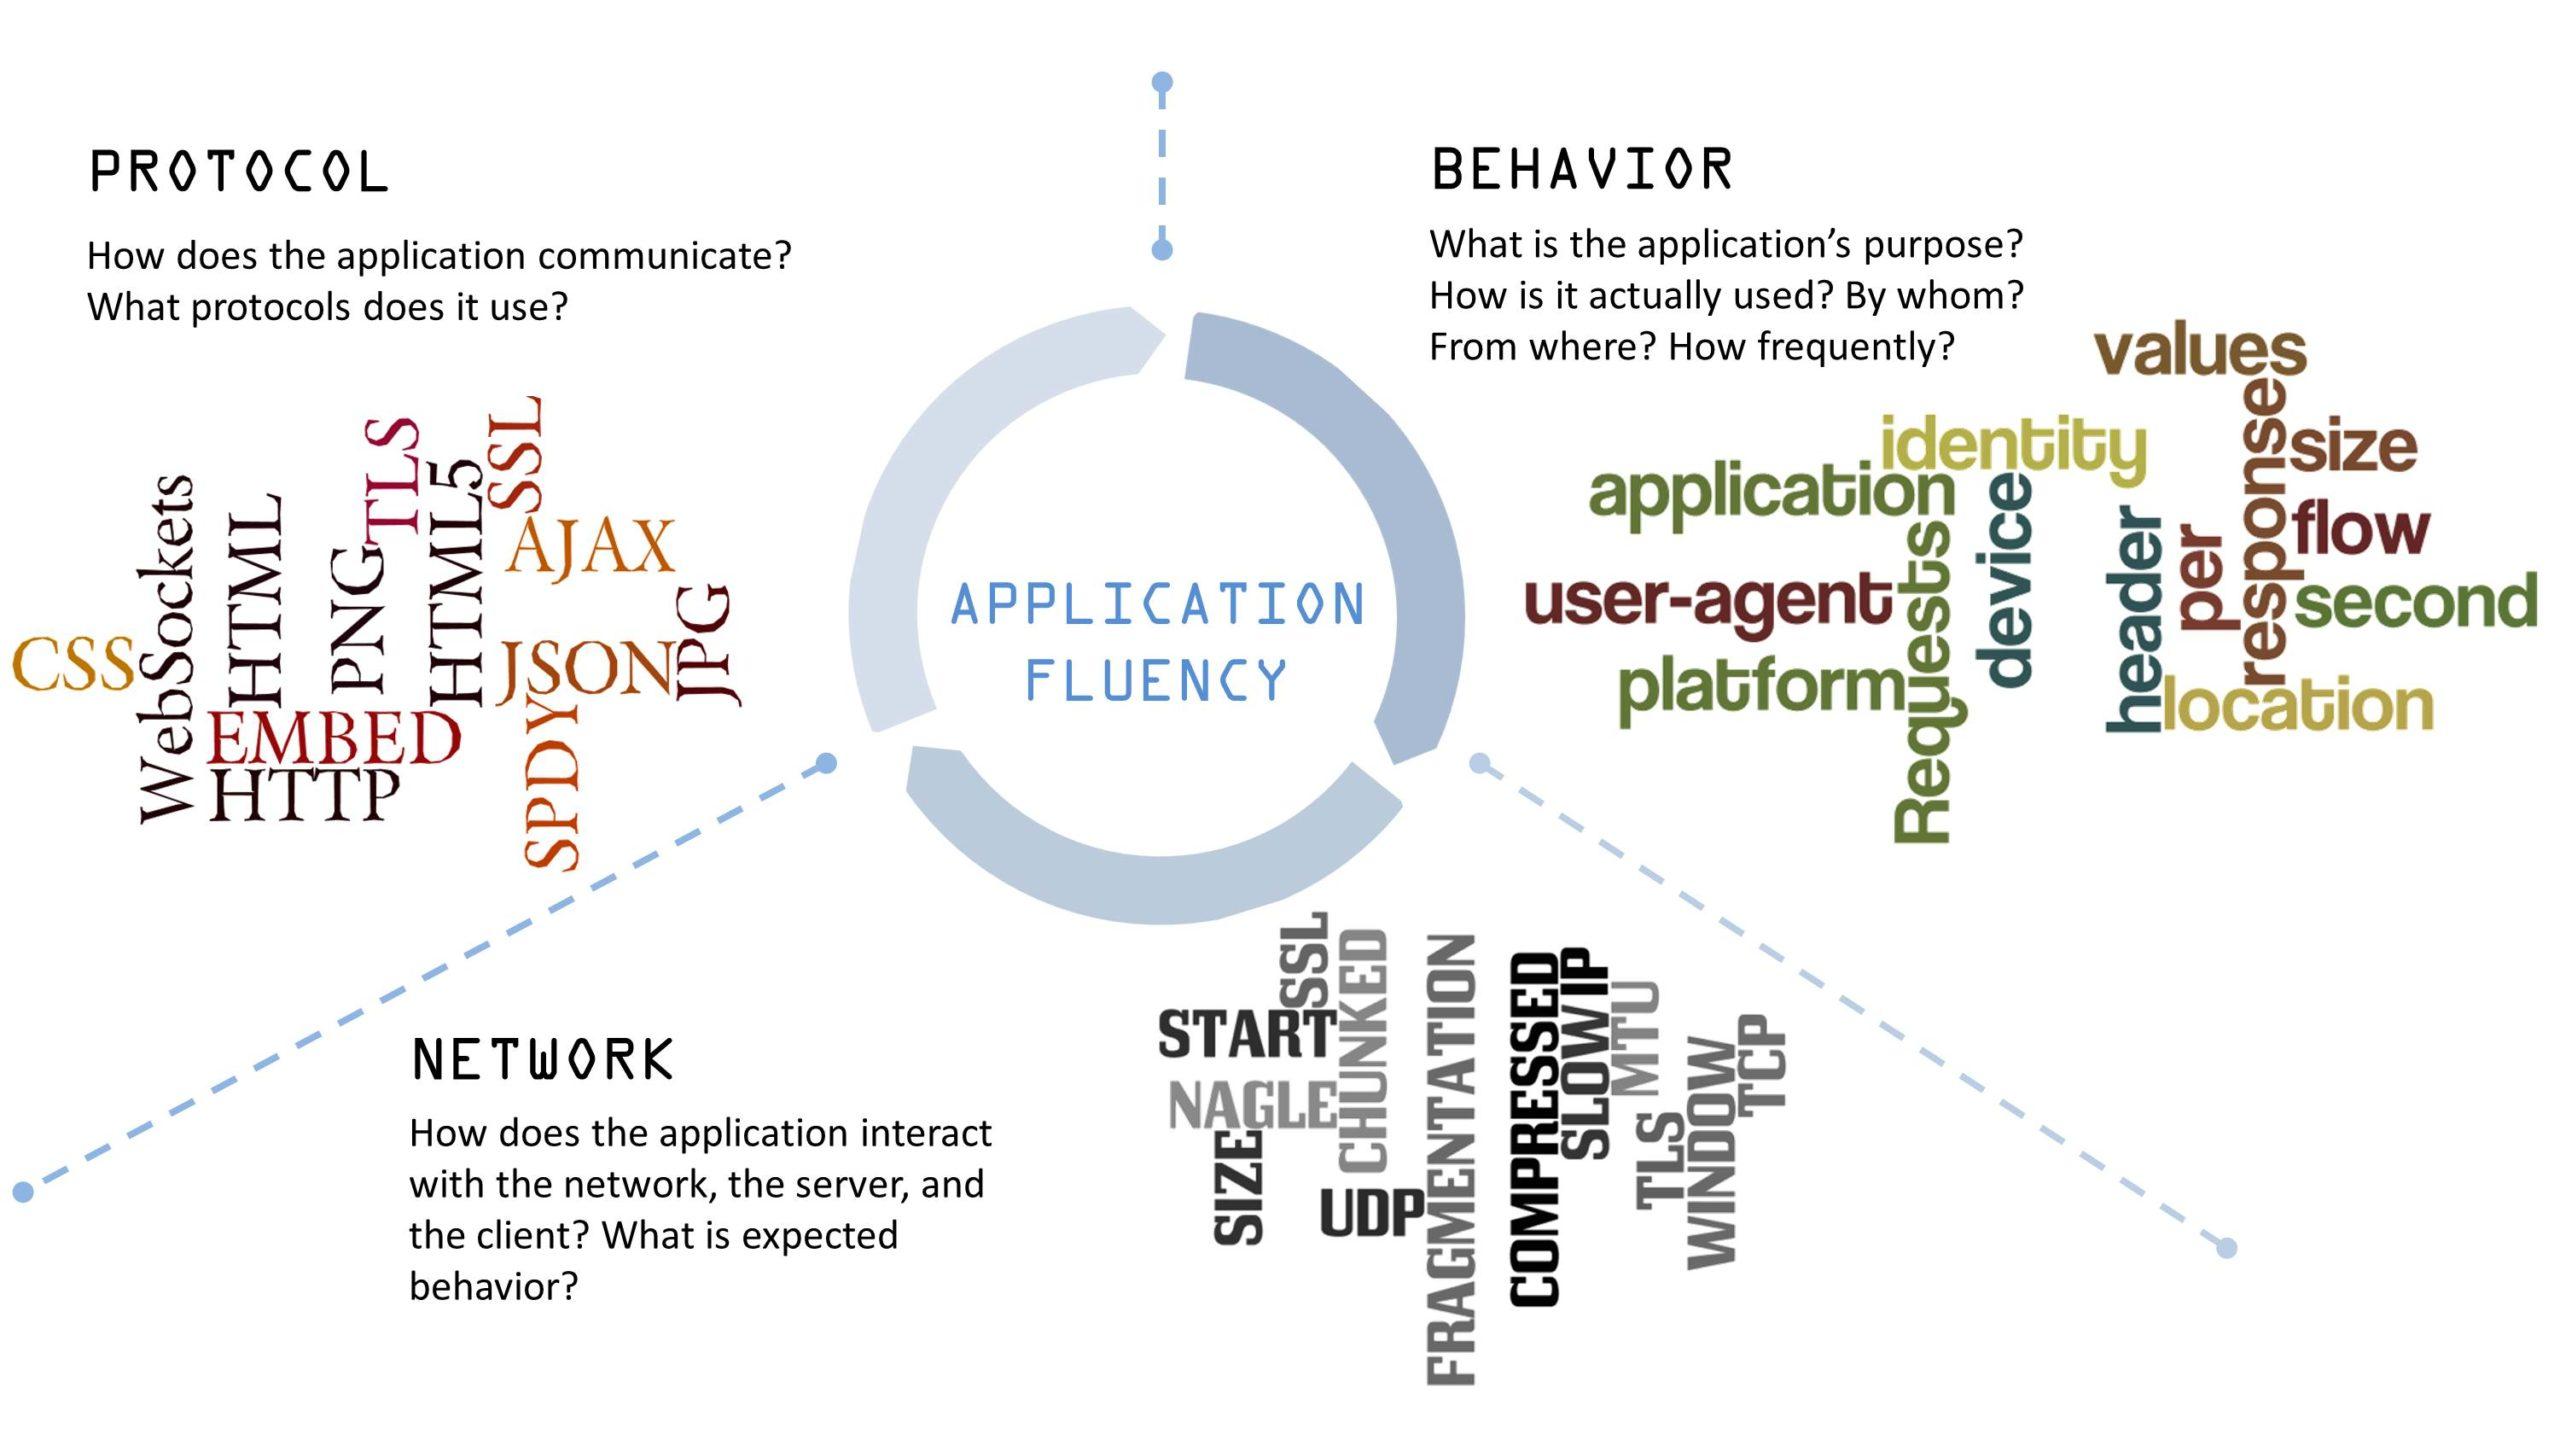 Application fluency